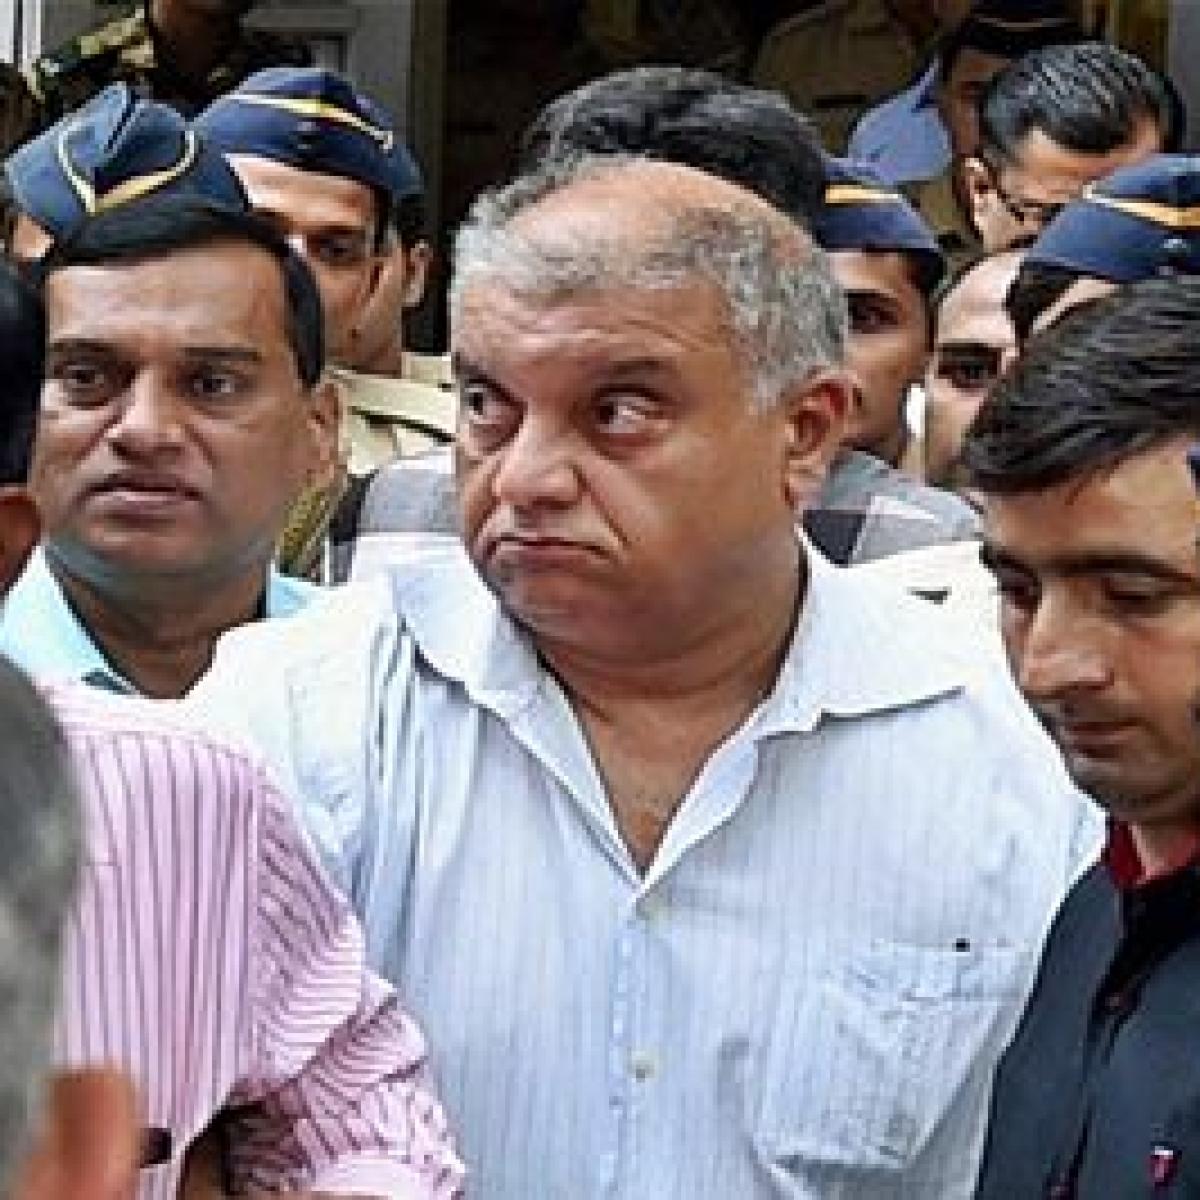 Sheena Bora Murder: Indrani's husband Peter Mukerjea gets bail